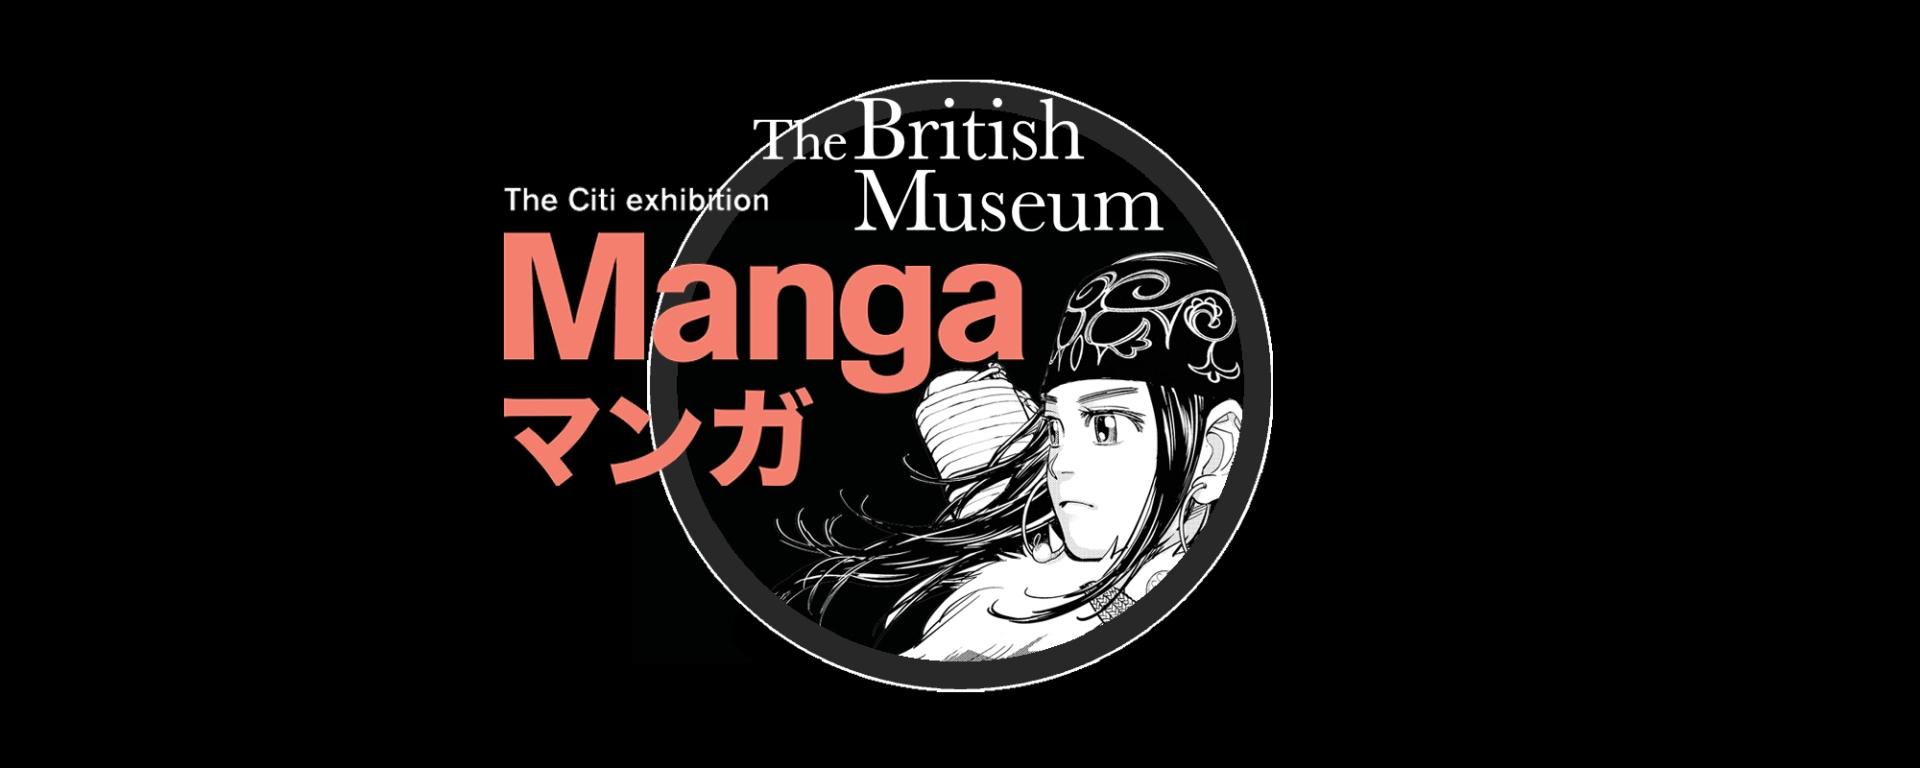 British Musuem The Citi exhibition Manga London 2019